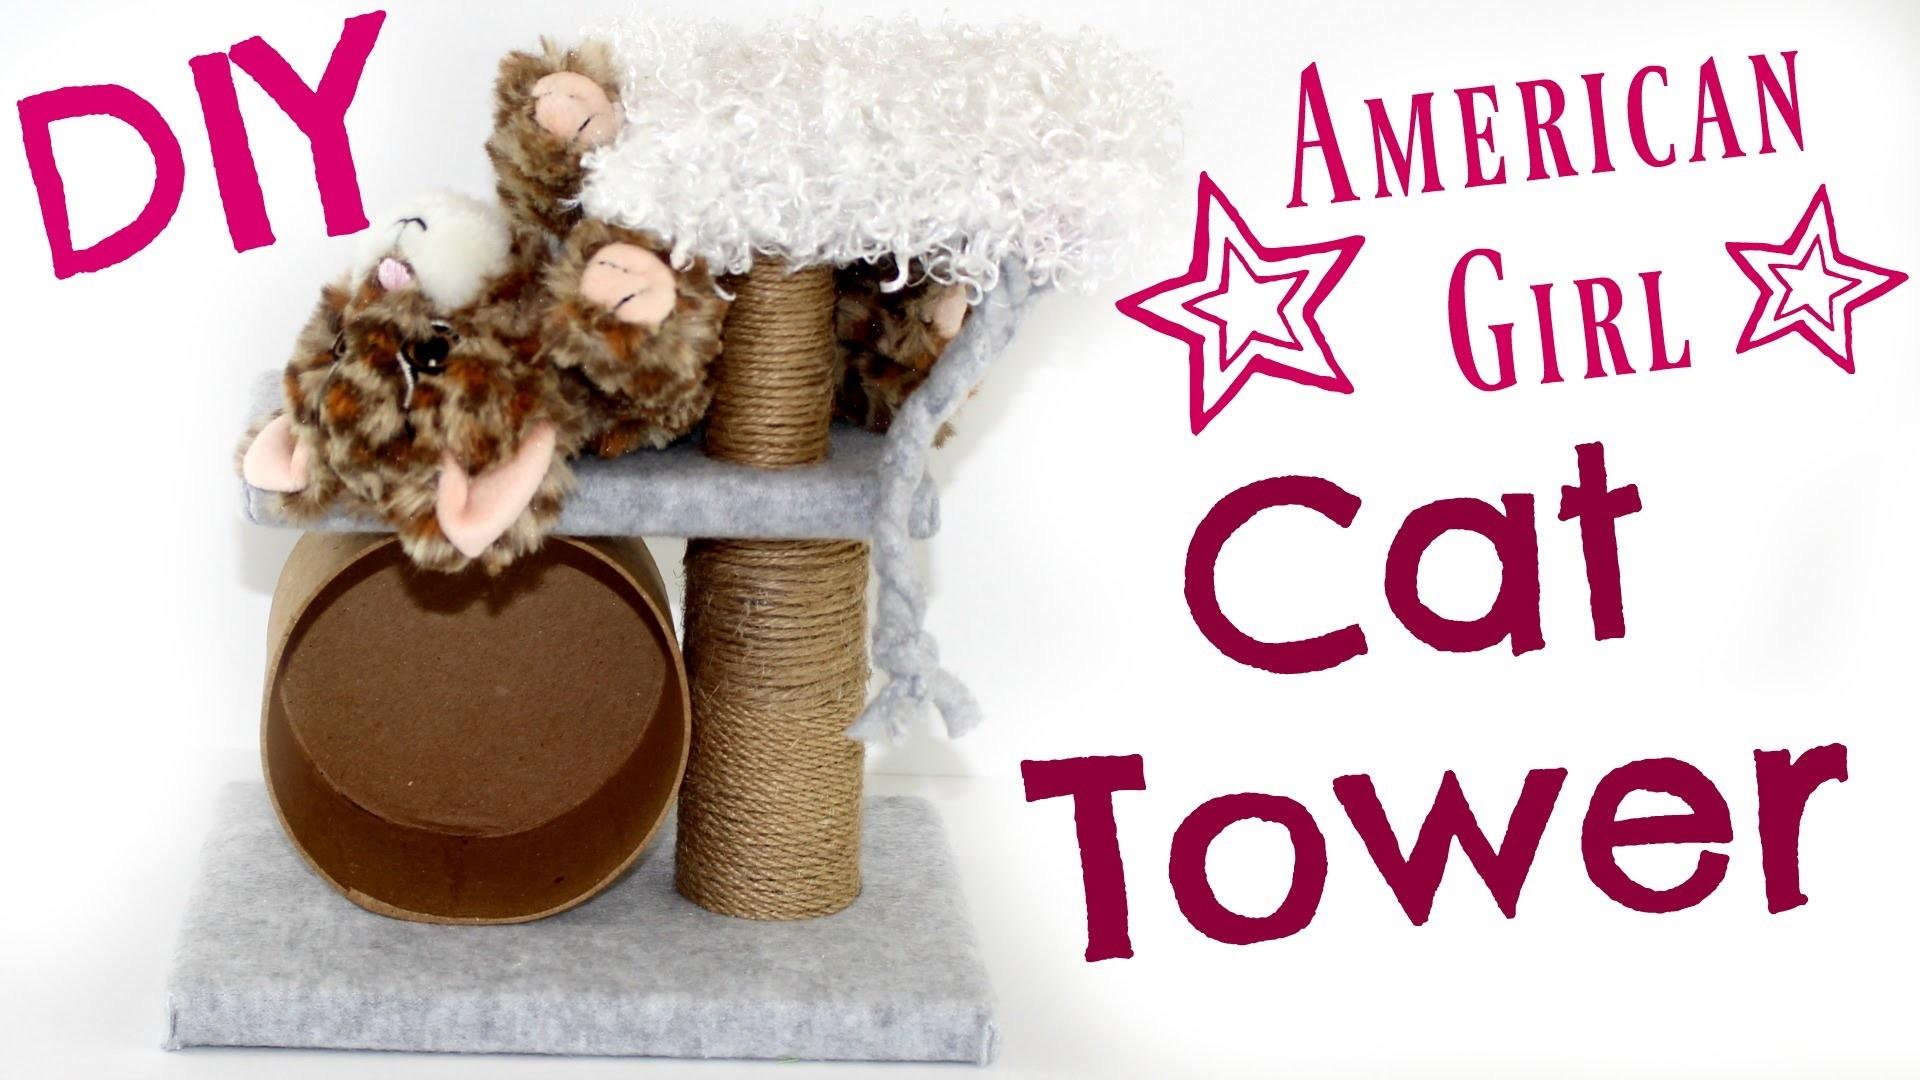 American Girl Doll Pet Toys | DIY American Girl Doll Cat Tower Craft